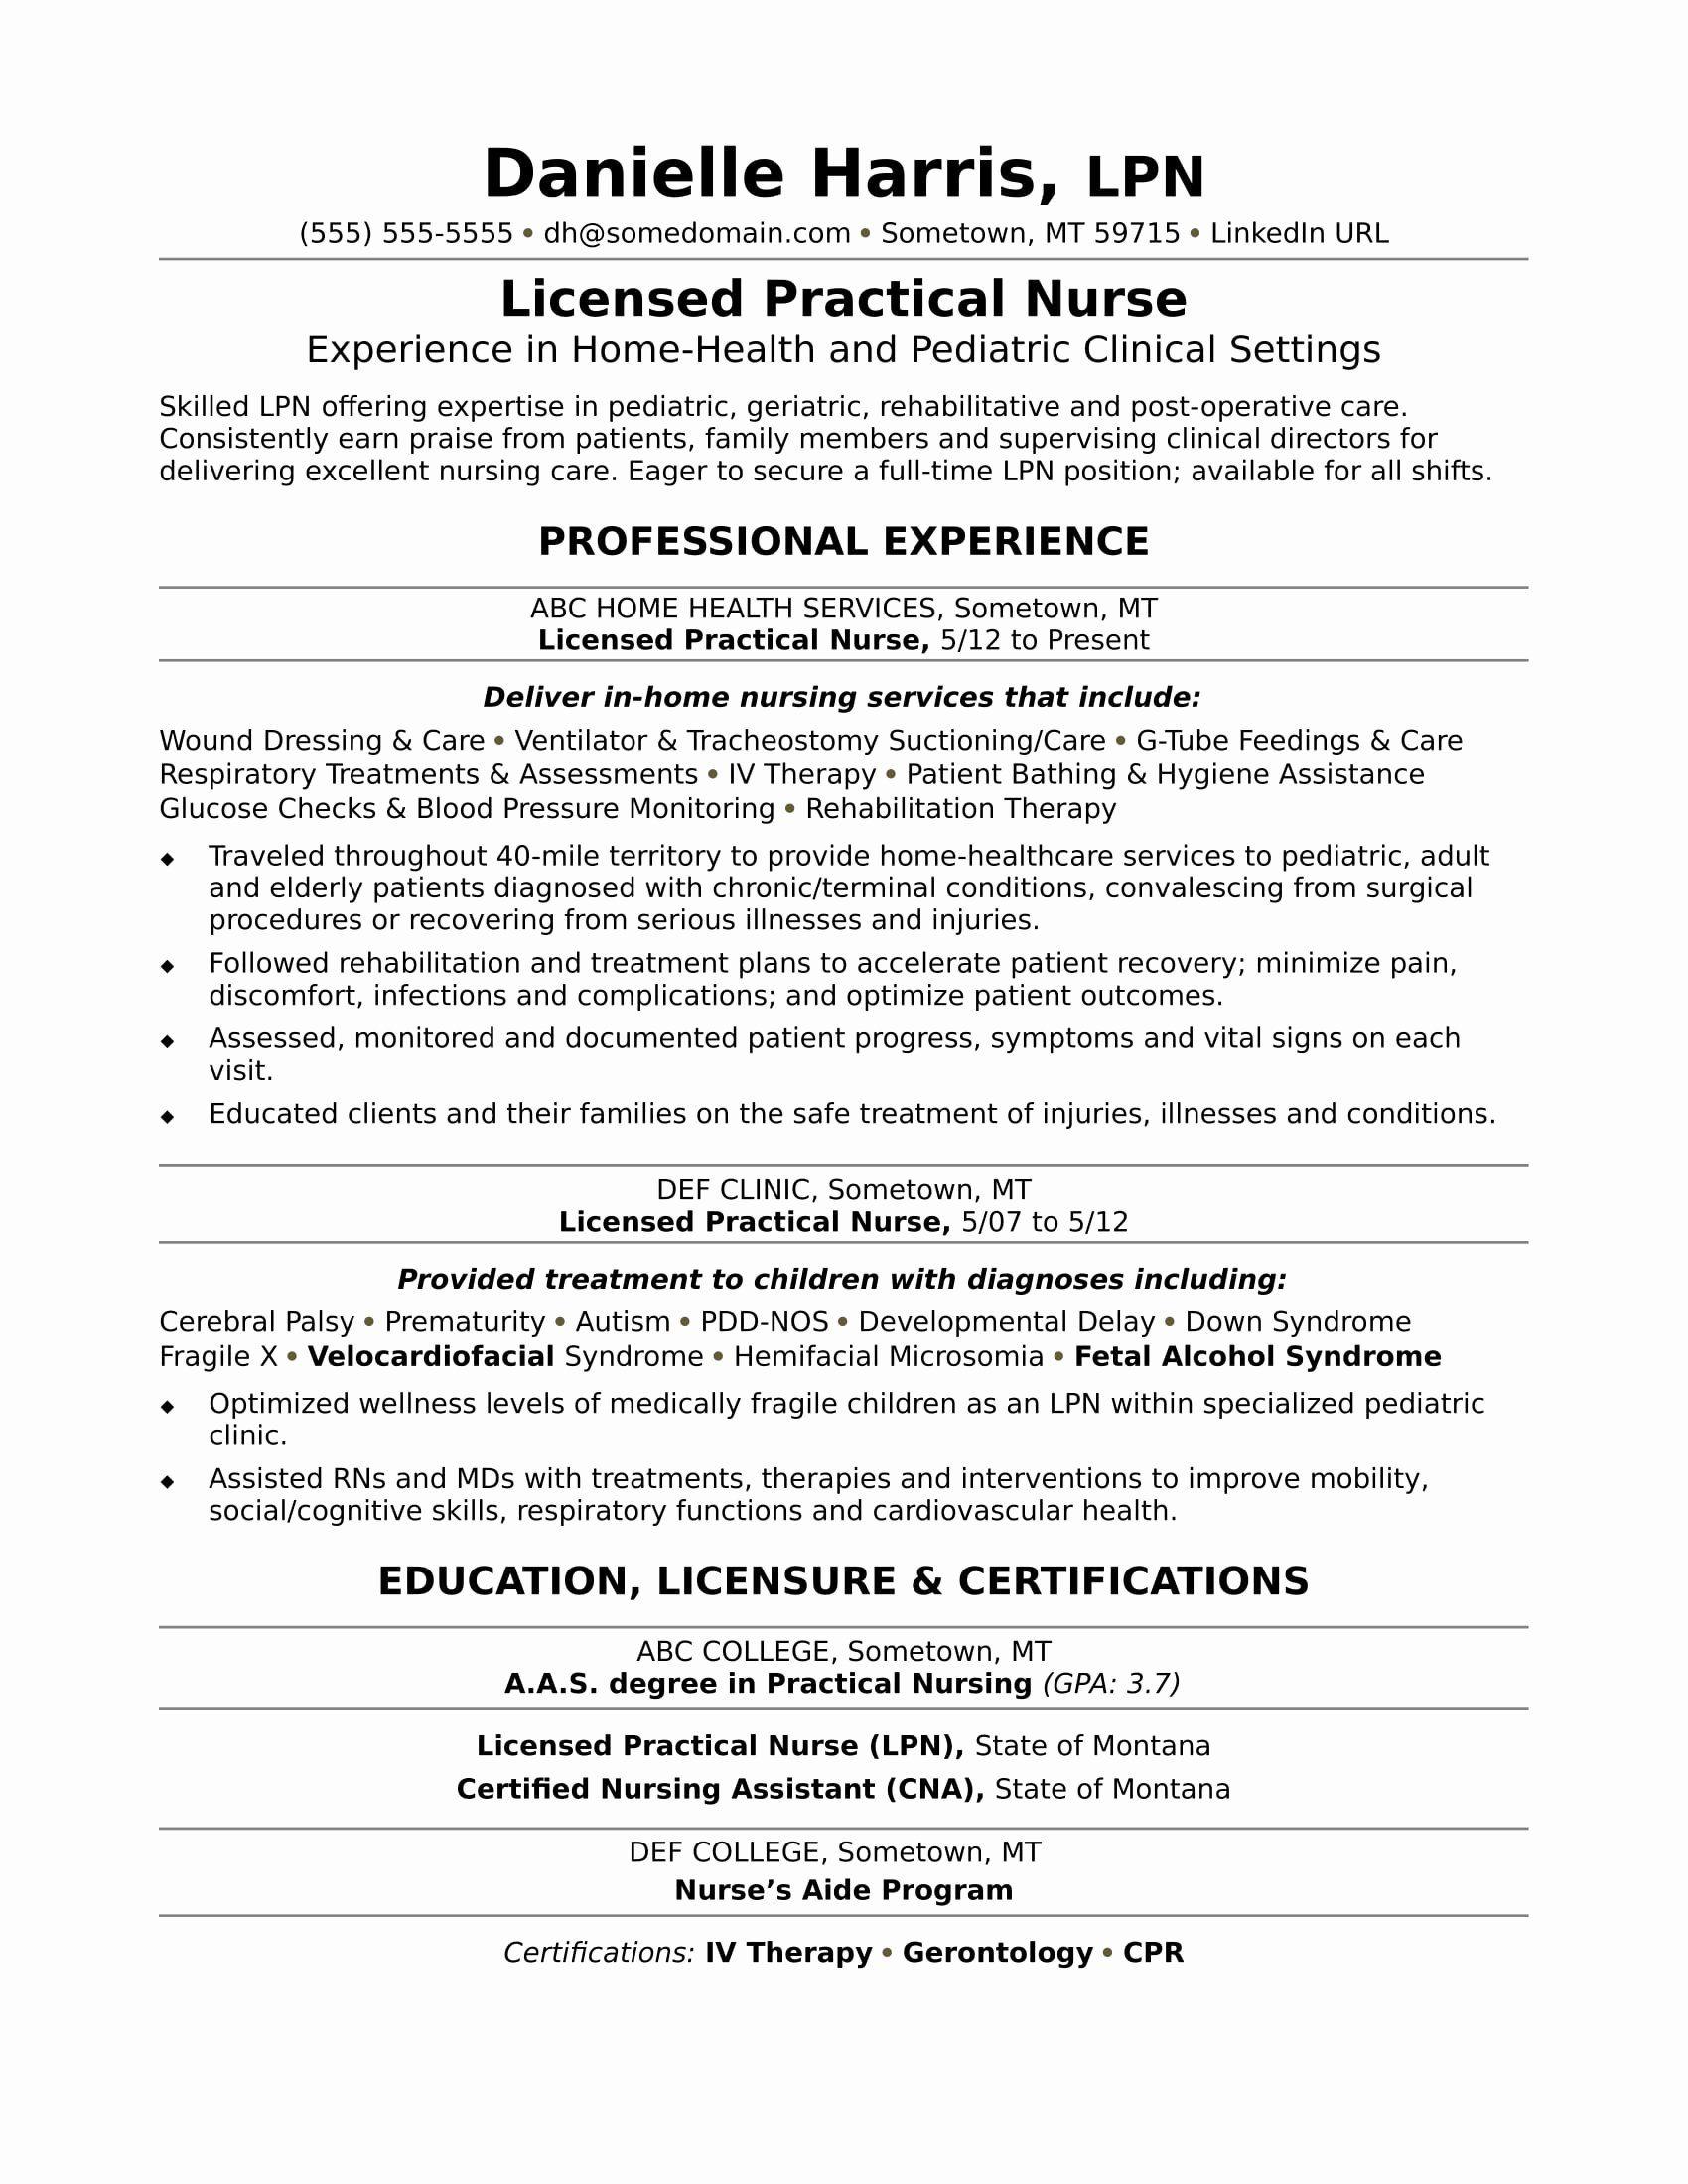 25 Nursing Student Resume Template in 2020 New grad